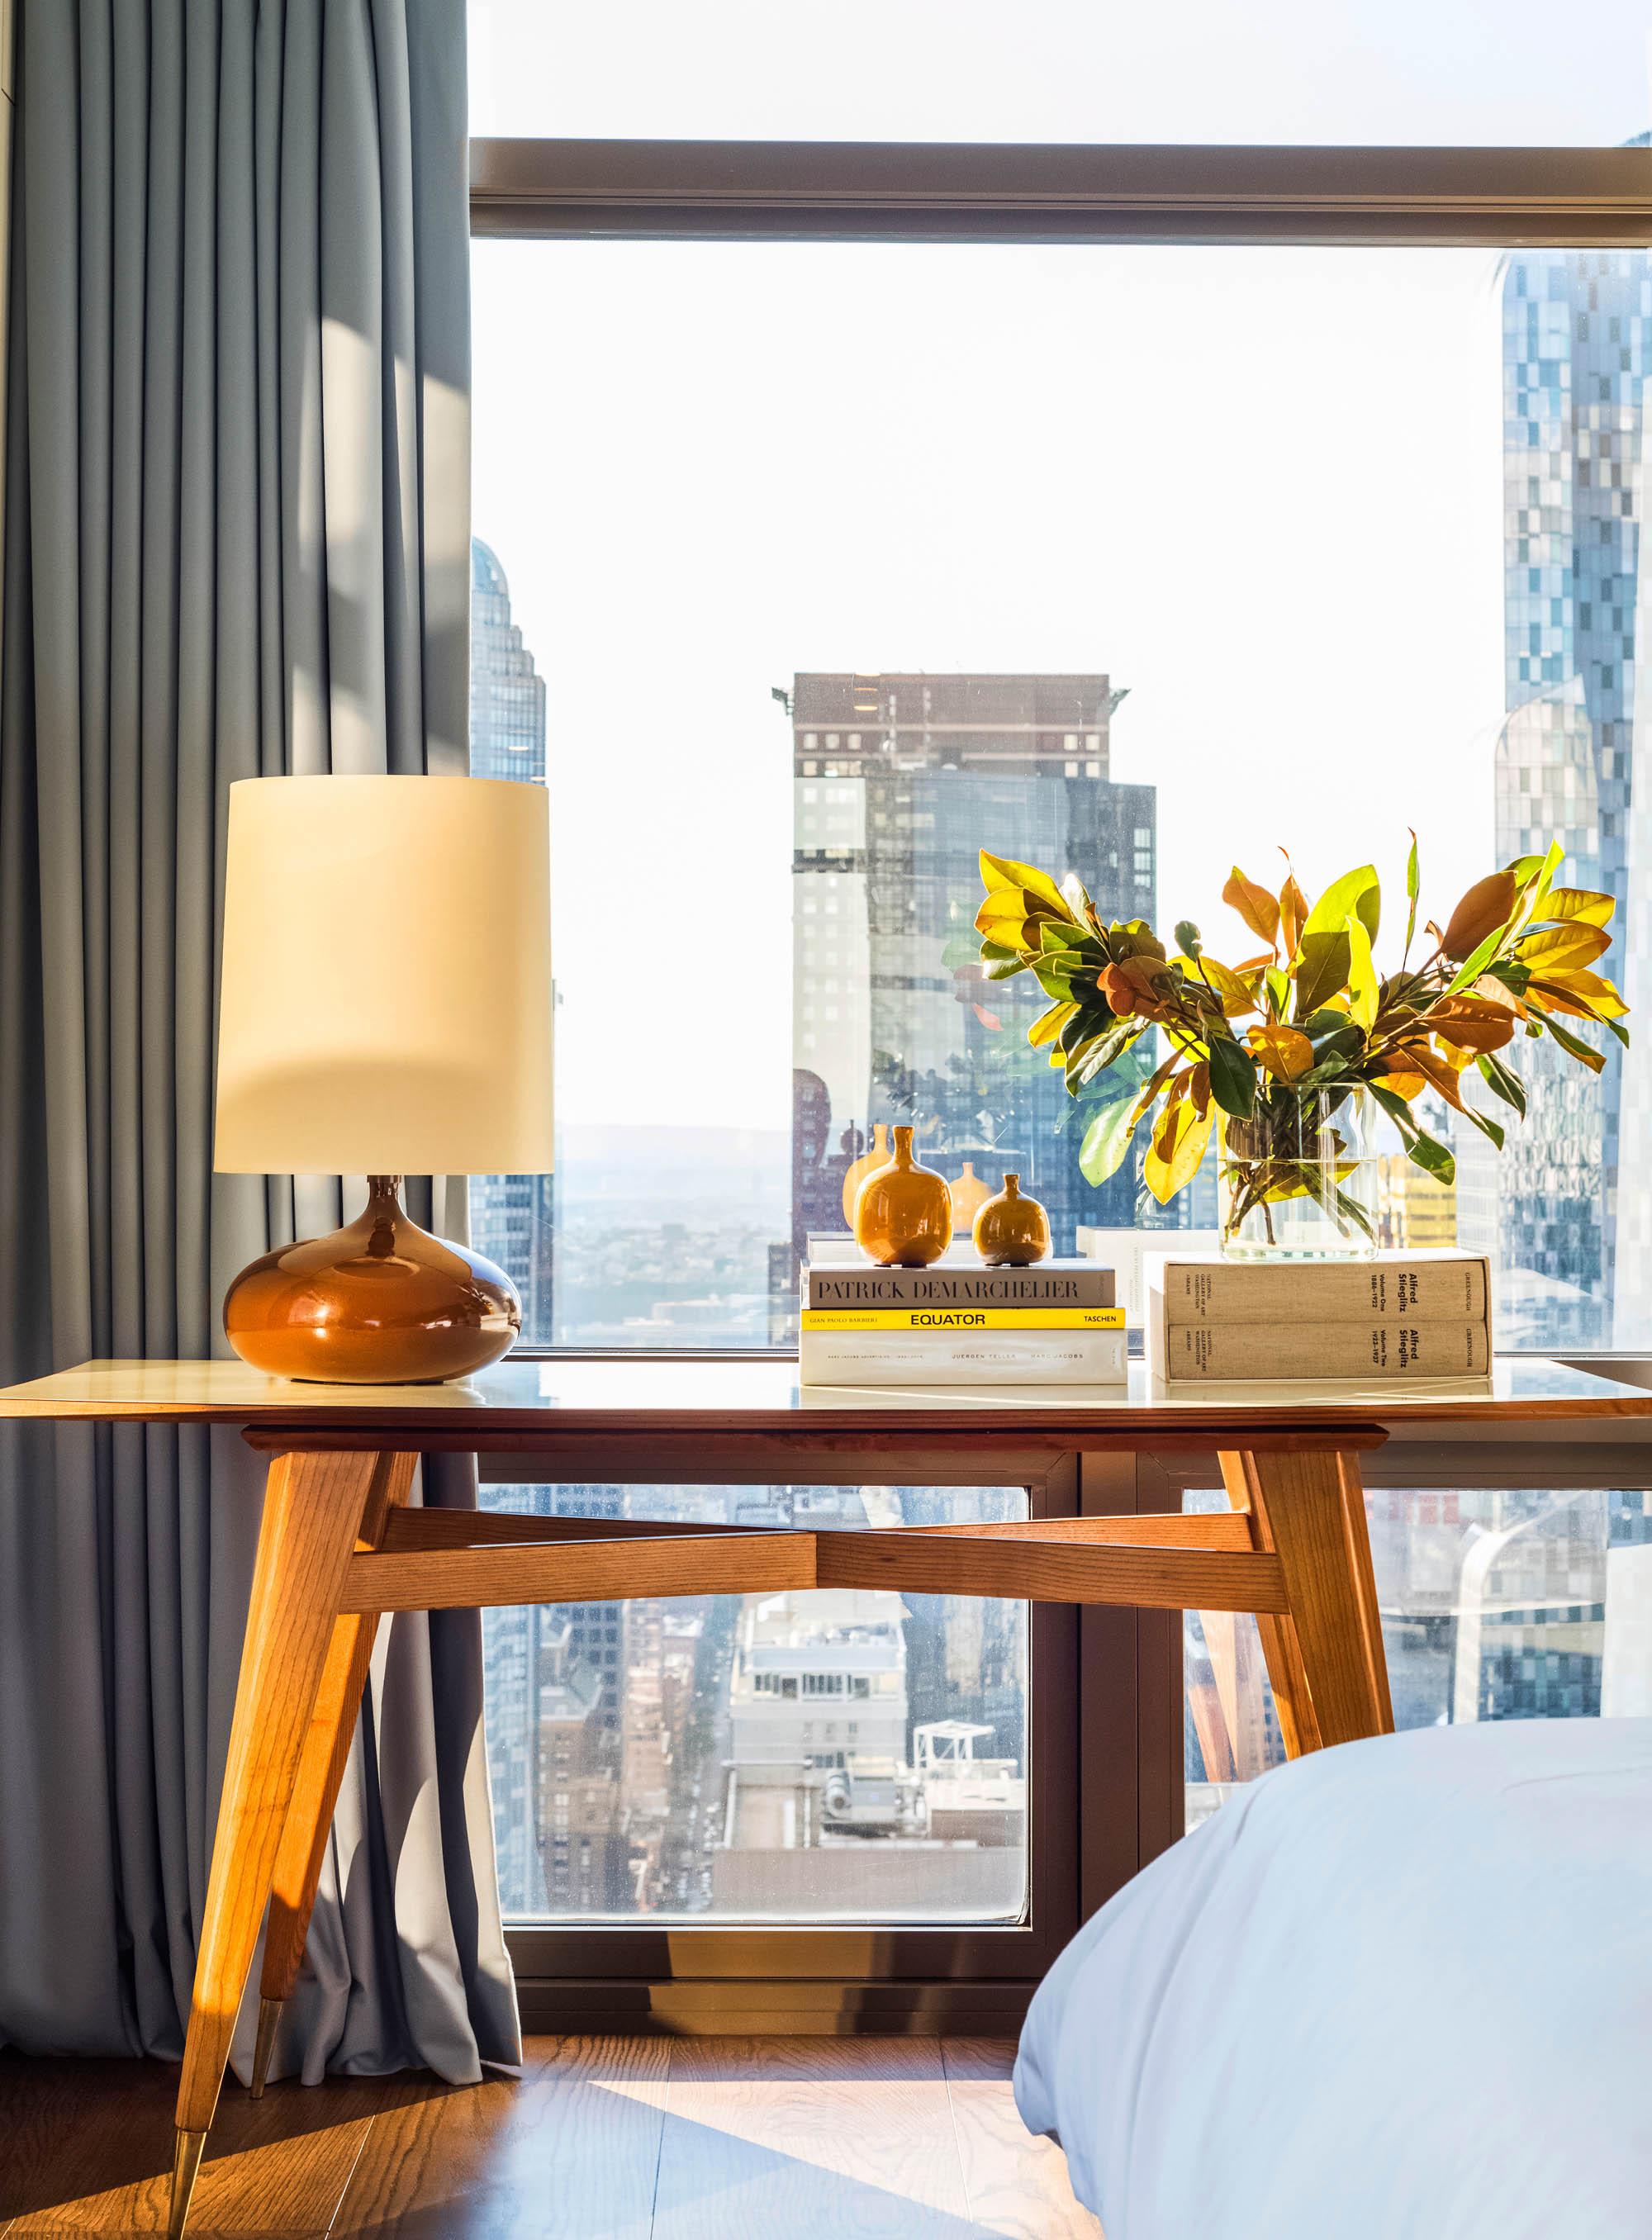 luis_laplace-5th_Avenue_New_York-9